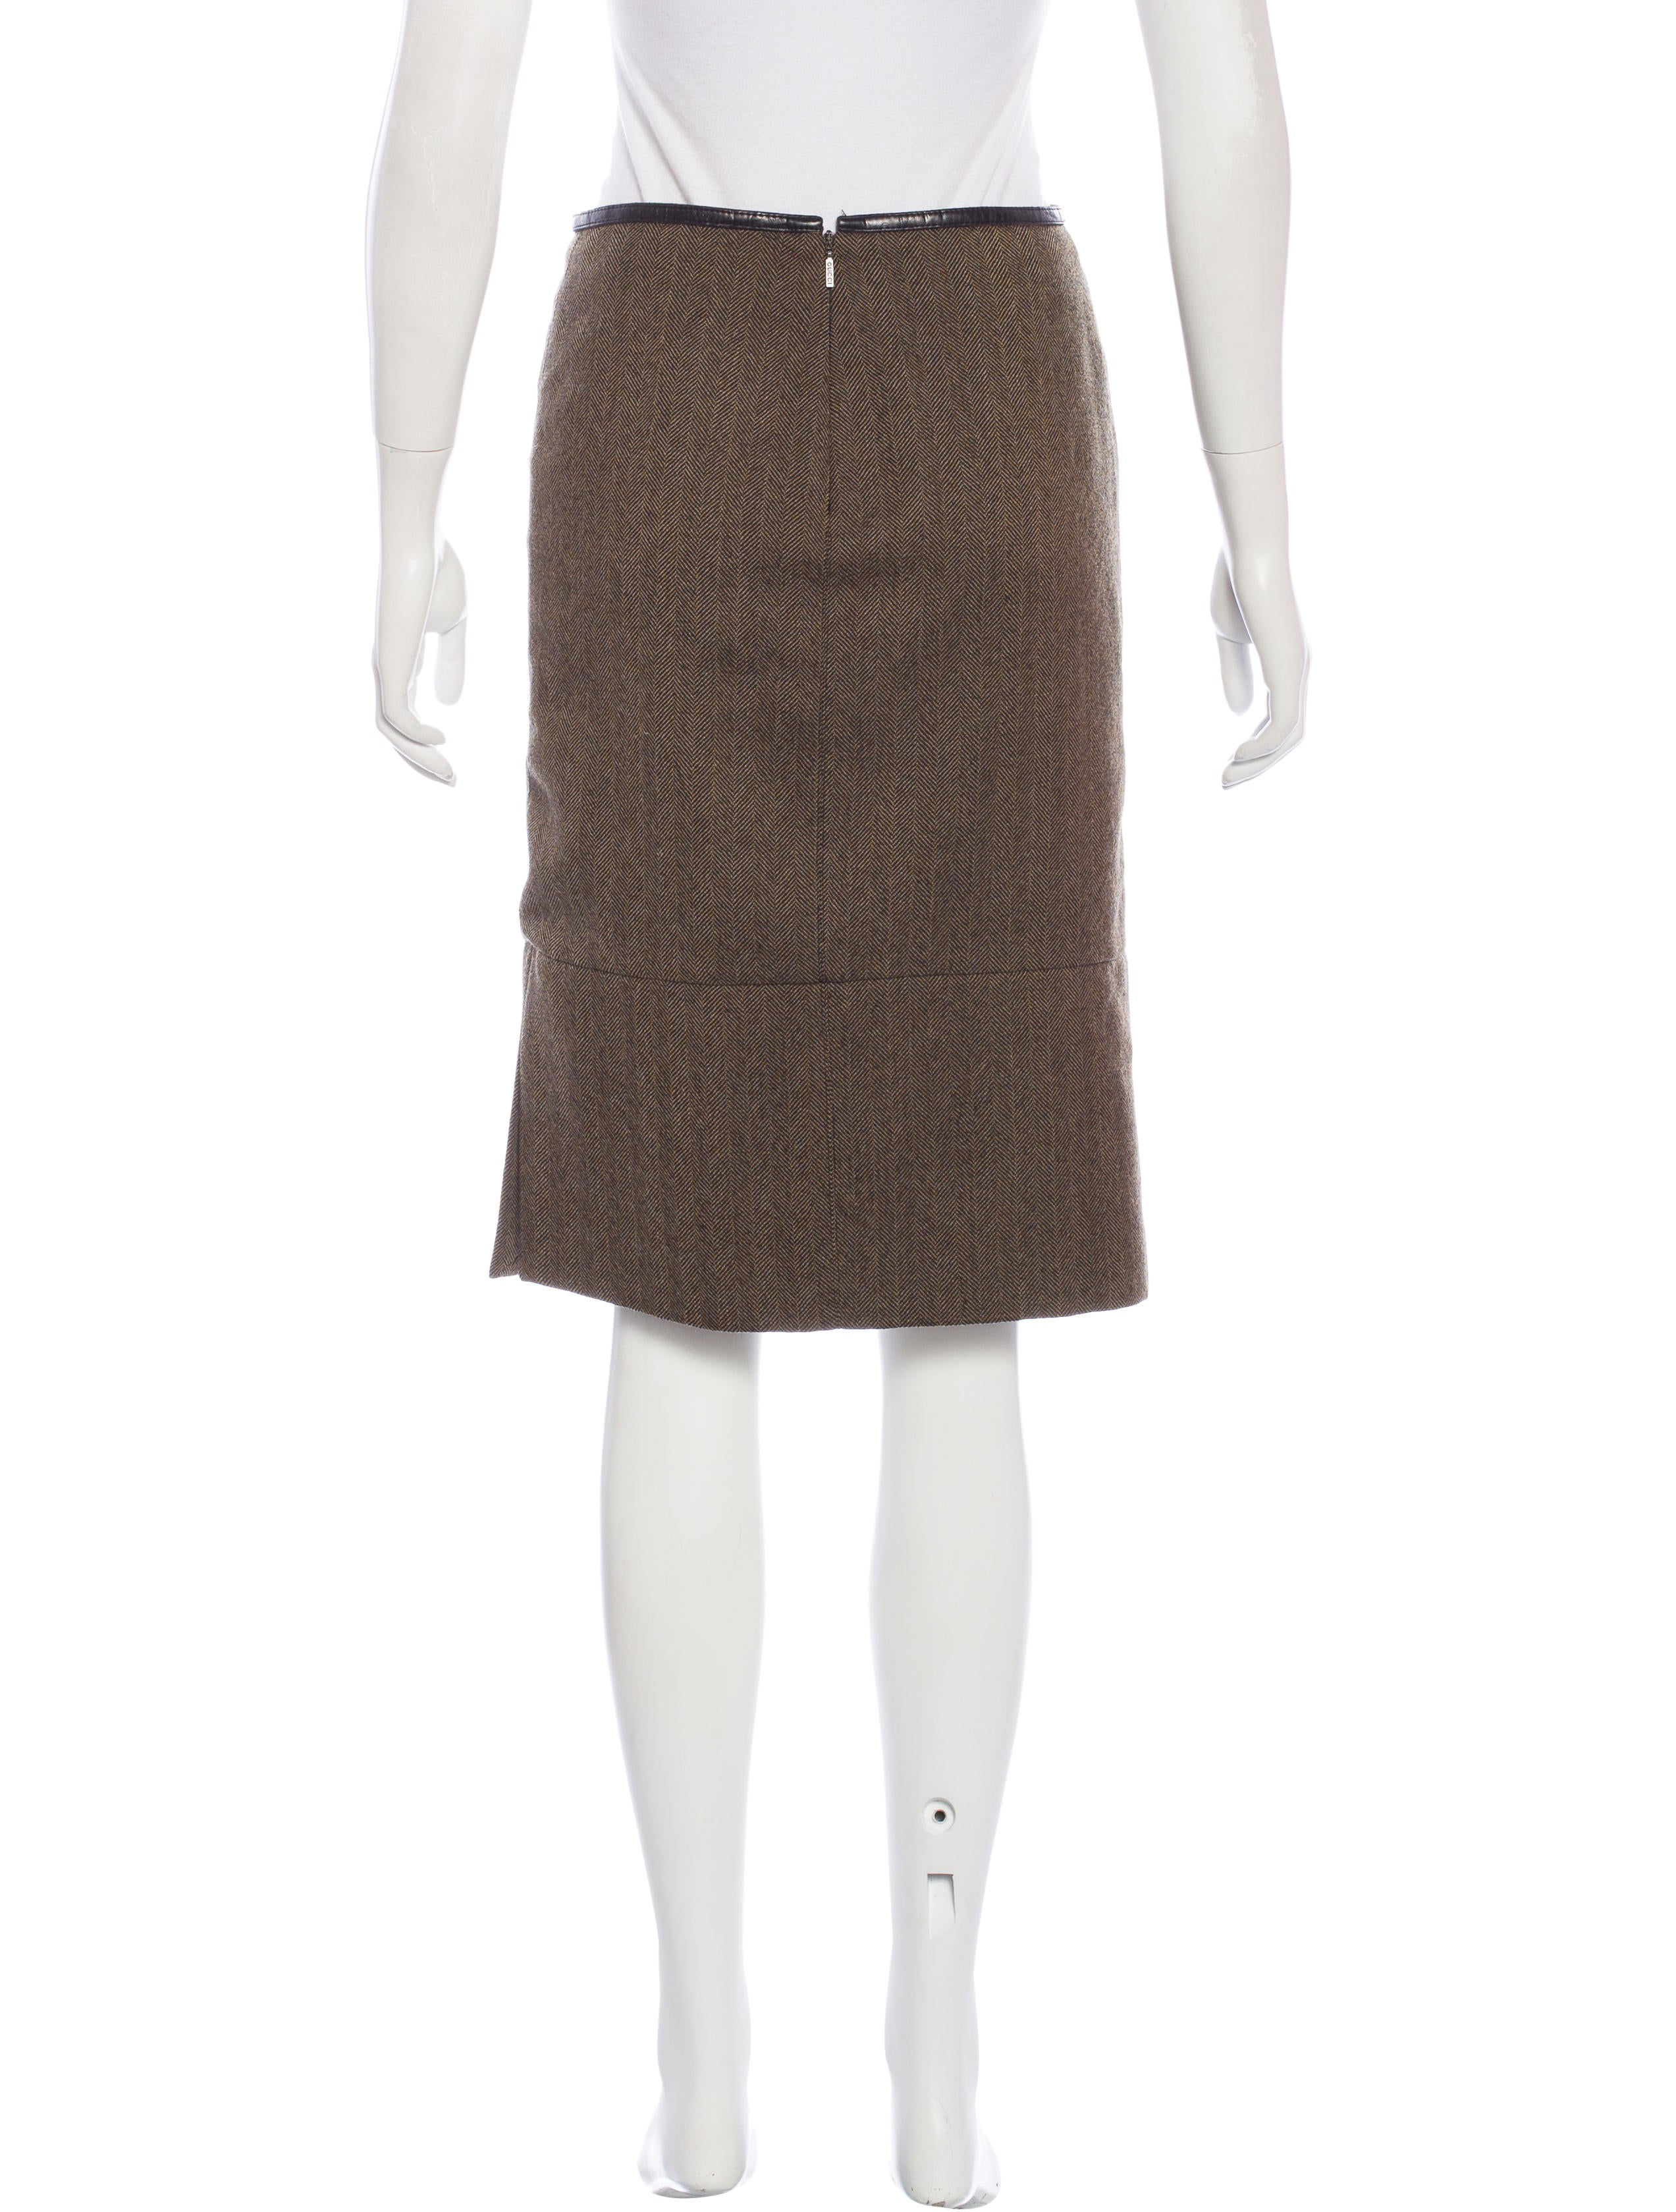 Gucci Wool Pencil Skirt - Clothing - GUC136397   The RealReal